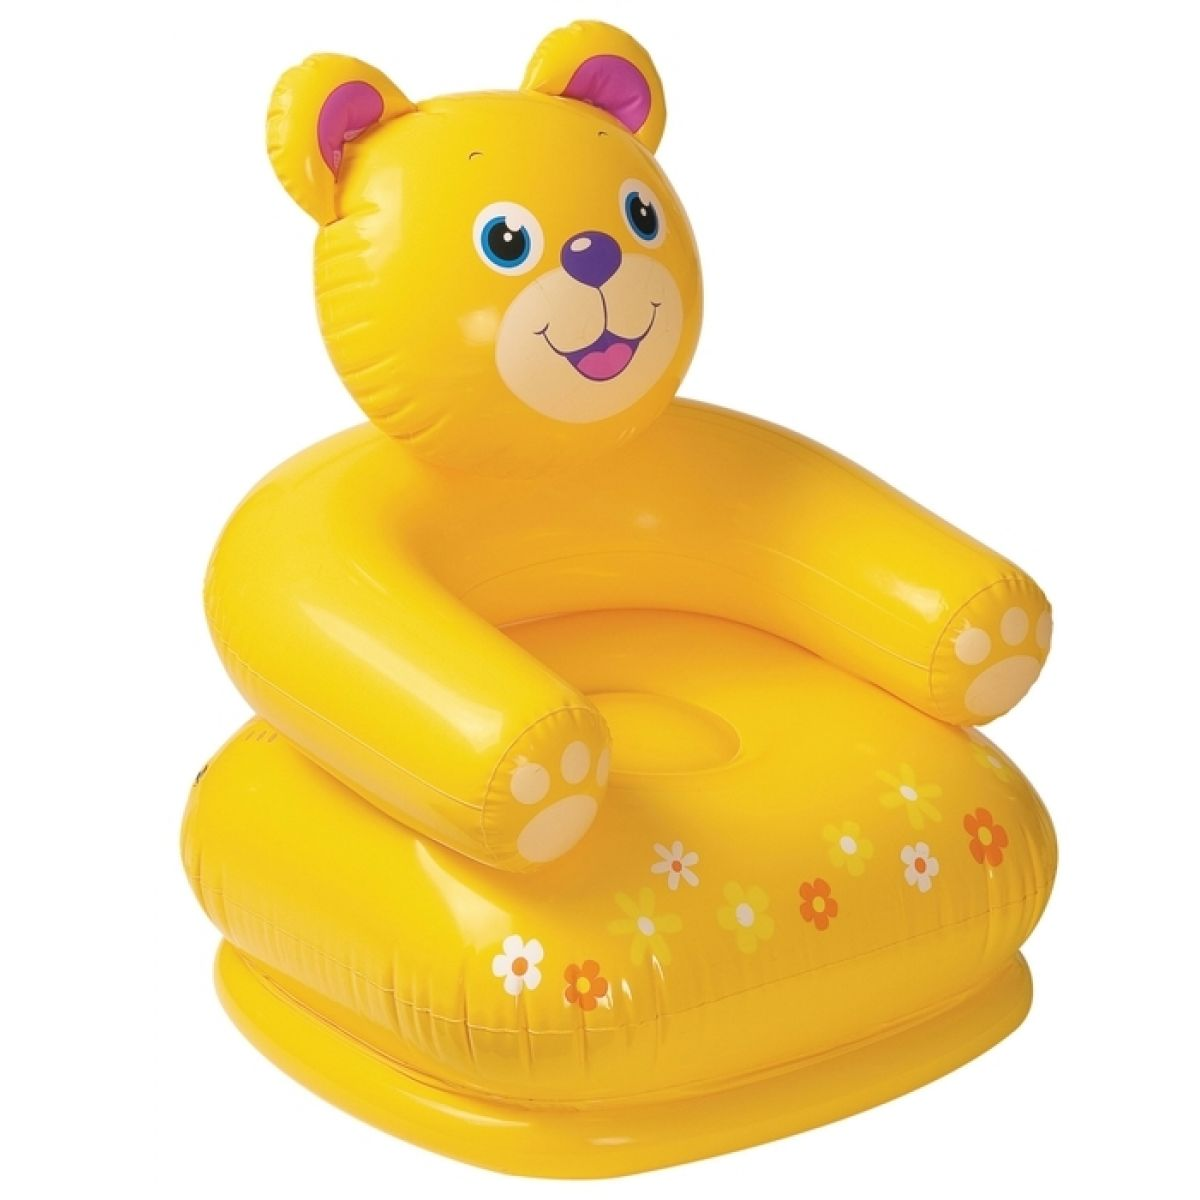 Intex 68556 Kreslo nafukovacie zvieratko - Medveď